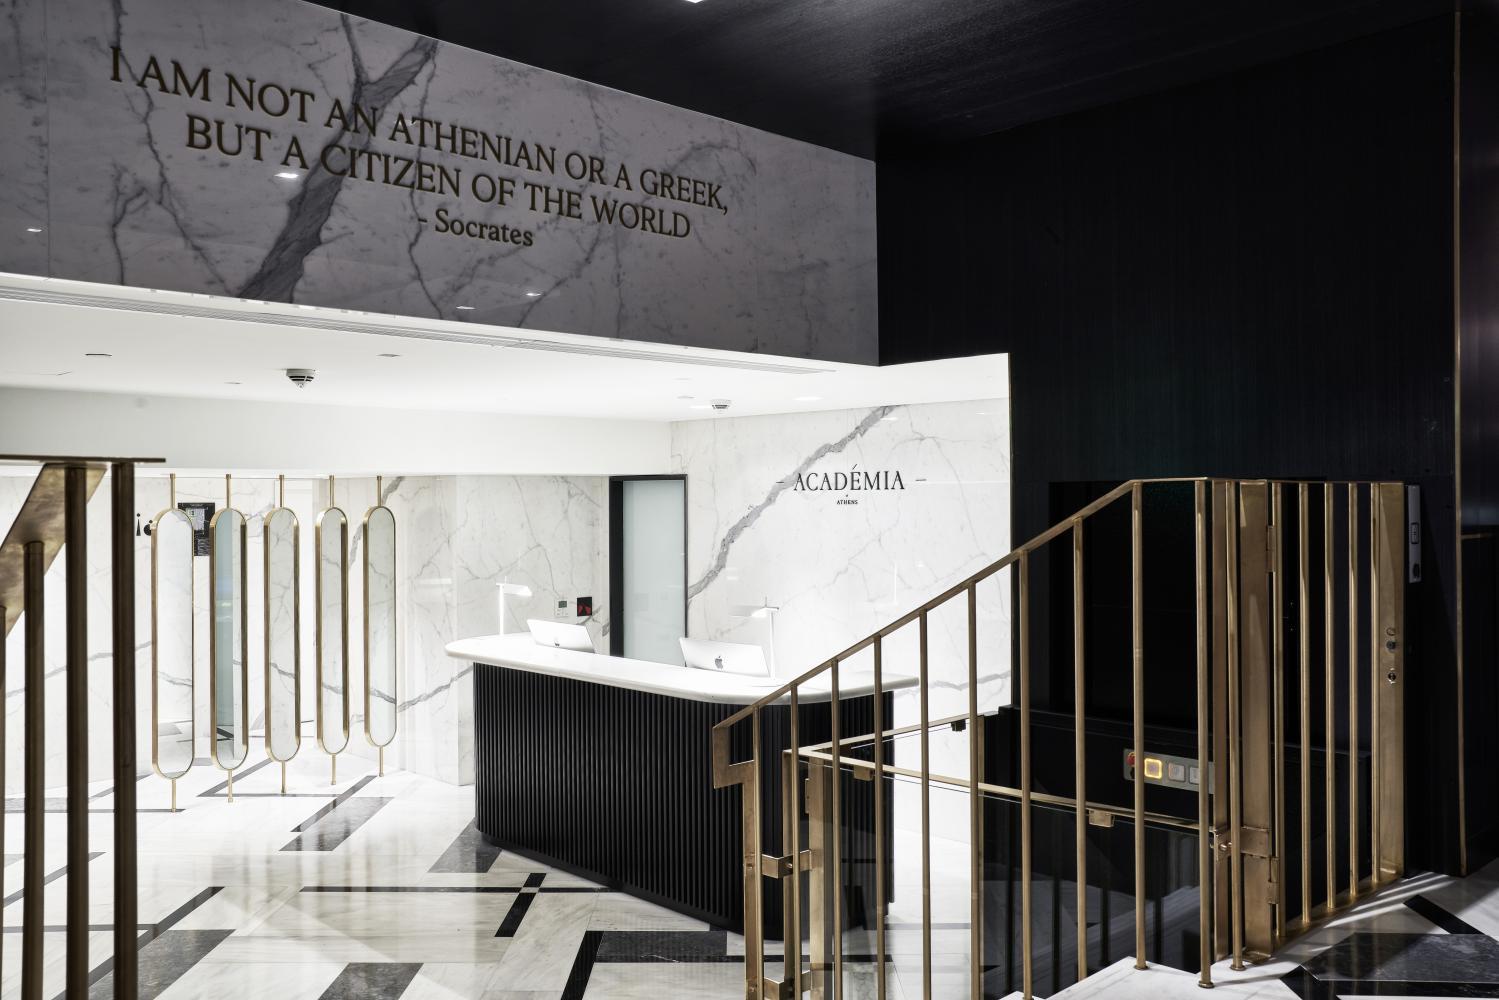 Academia Hotel of Athens - Image 5